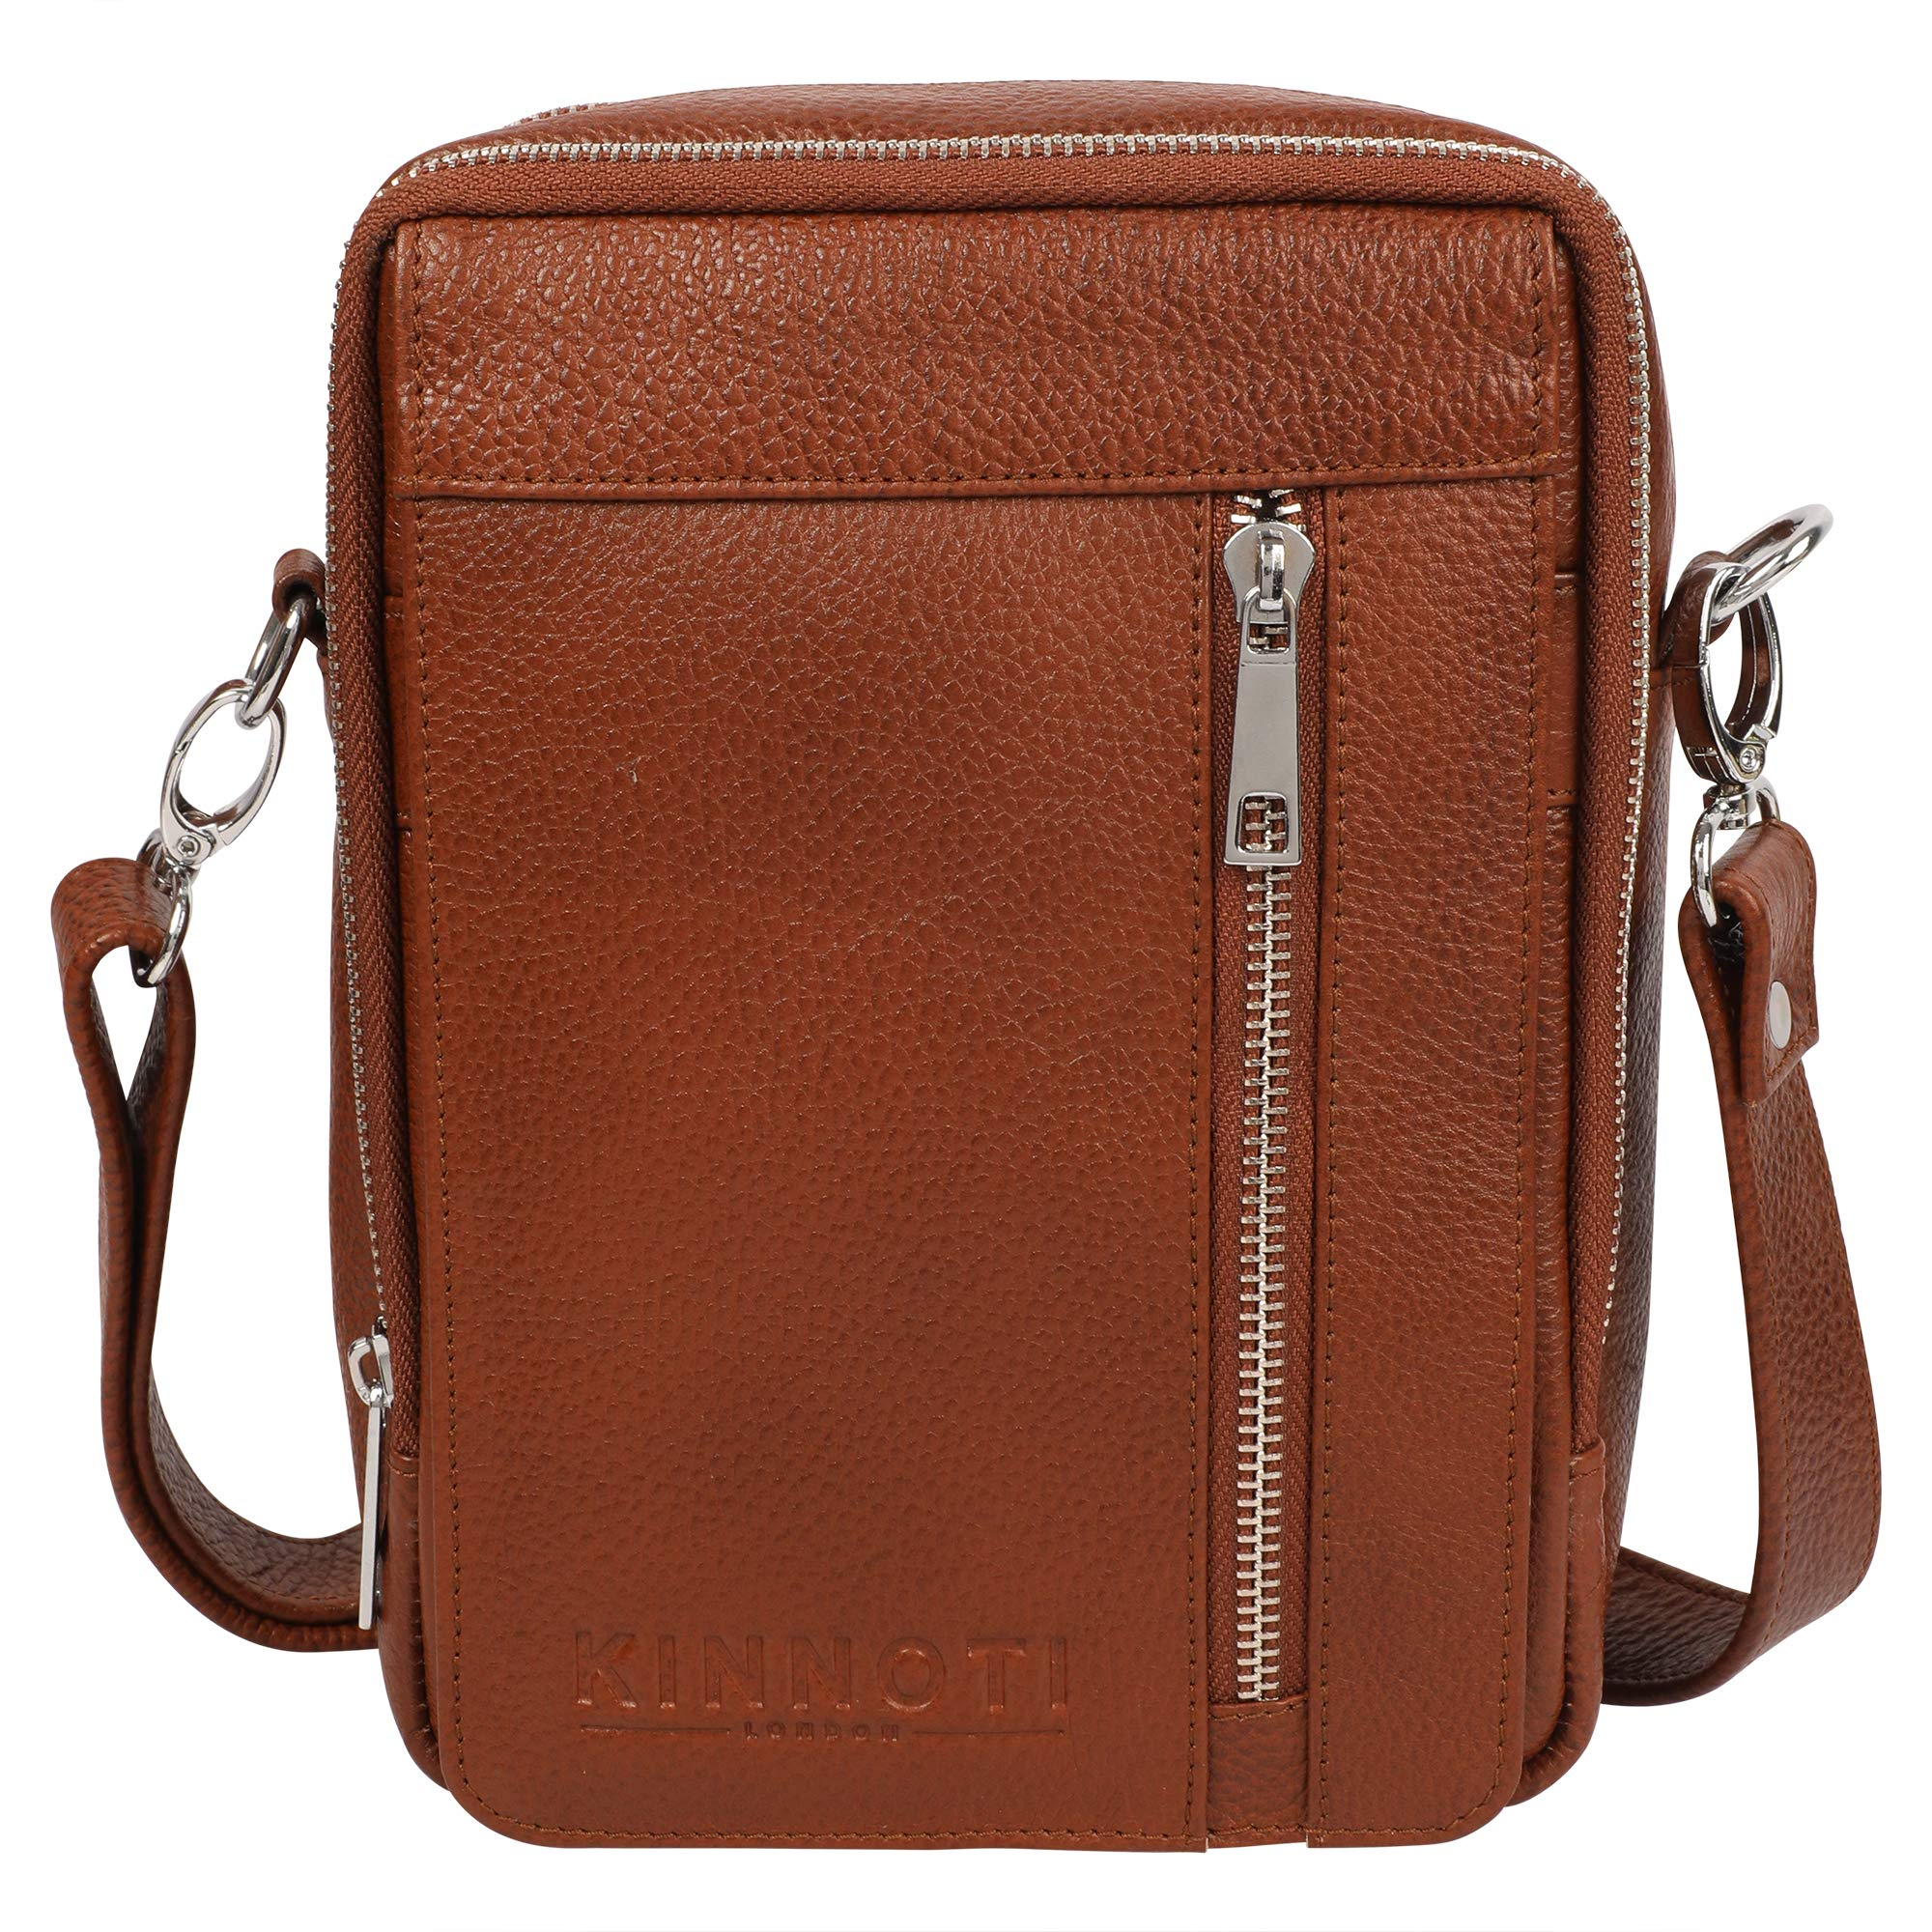 Kinnoti London Handmade Top Grain Italian Real Leather Messenger Sling Side Bag |Casual Style Small Shoulder Crossbody for Men and Women